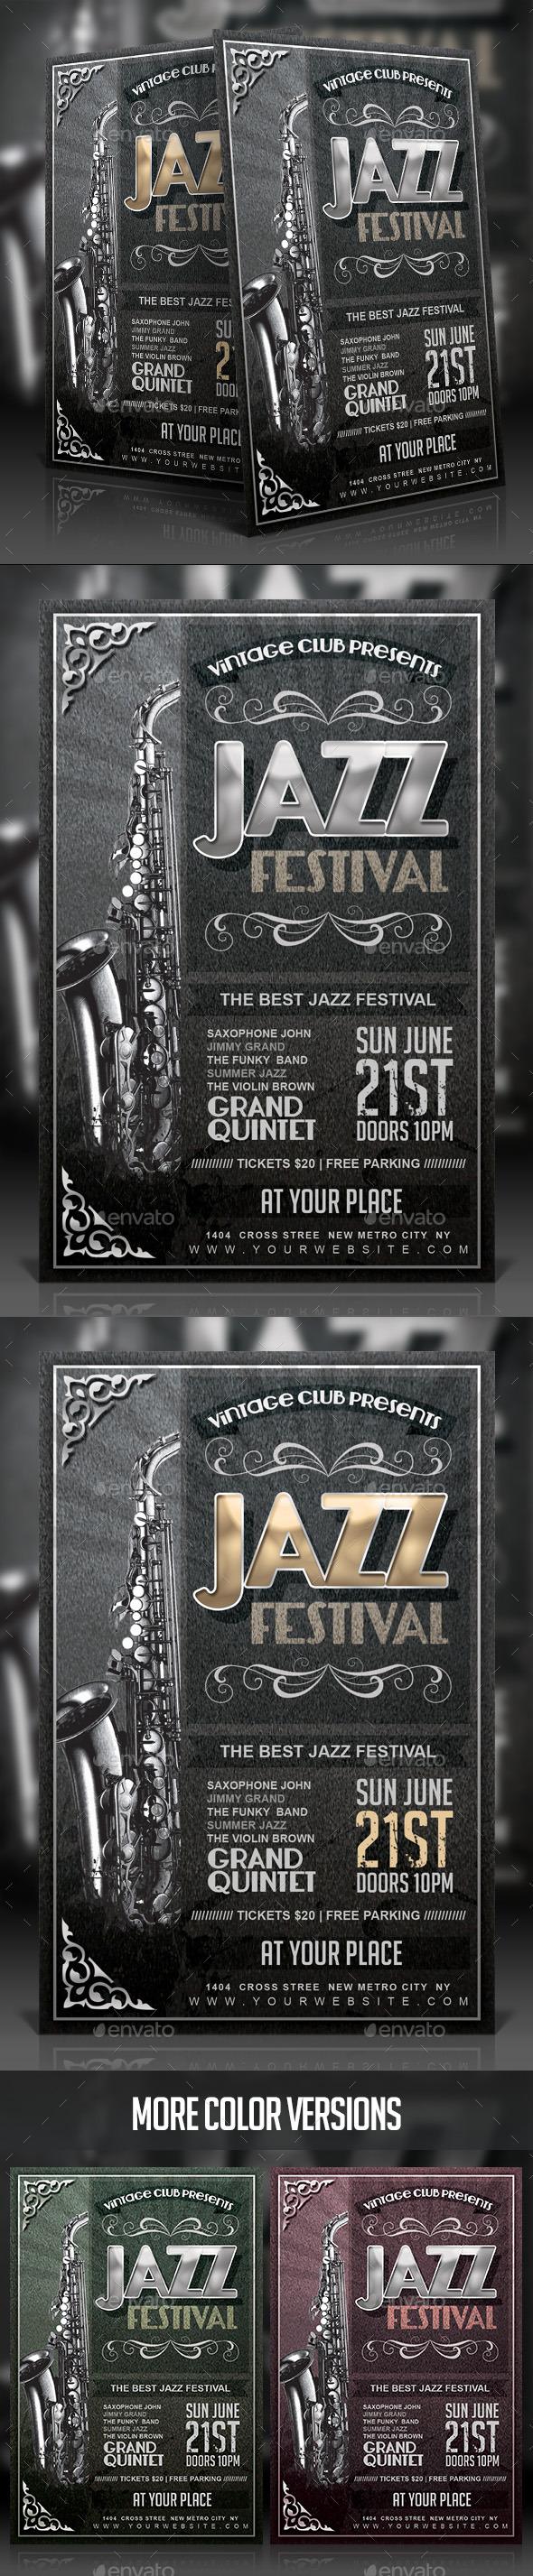 GraphicRiver Vintage Jazz Festival Flyer 11765041